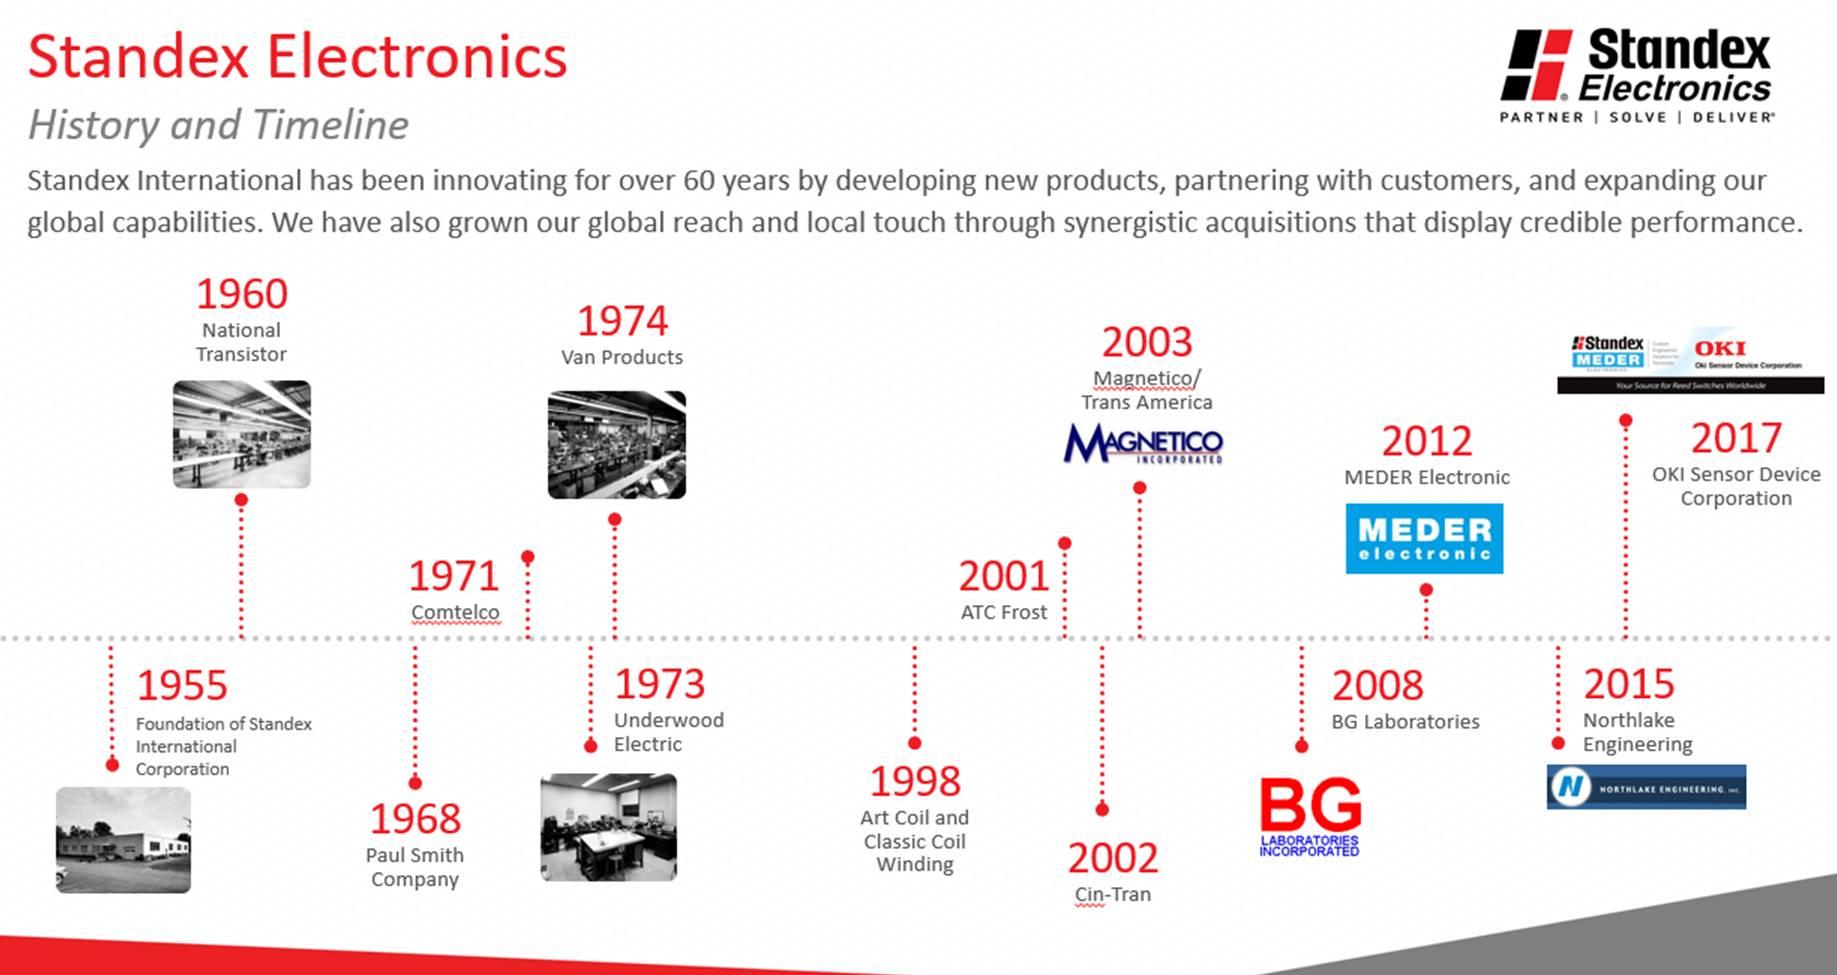 standex electronics timeline